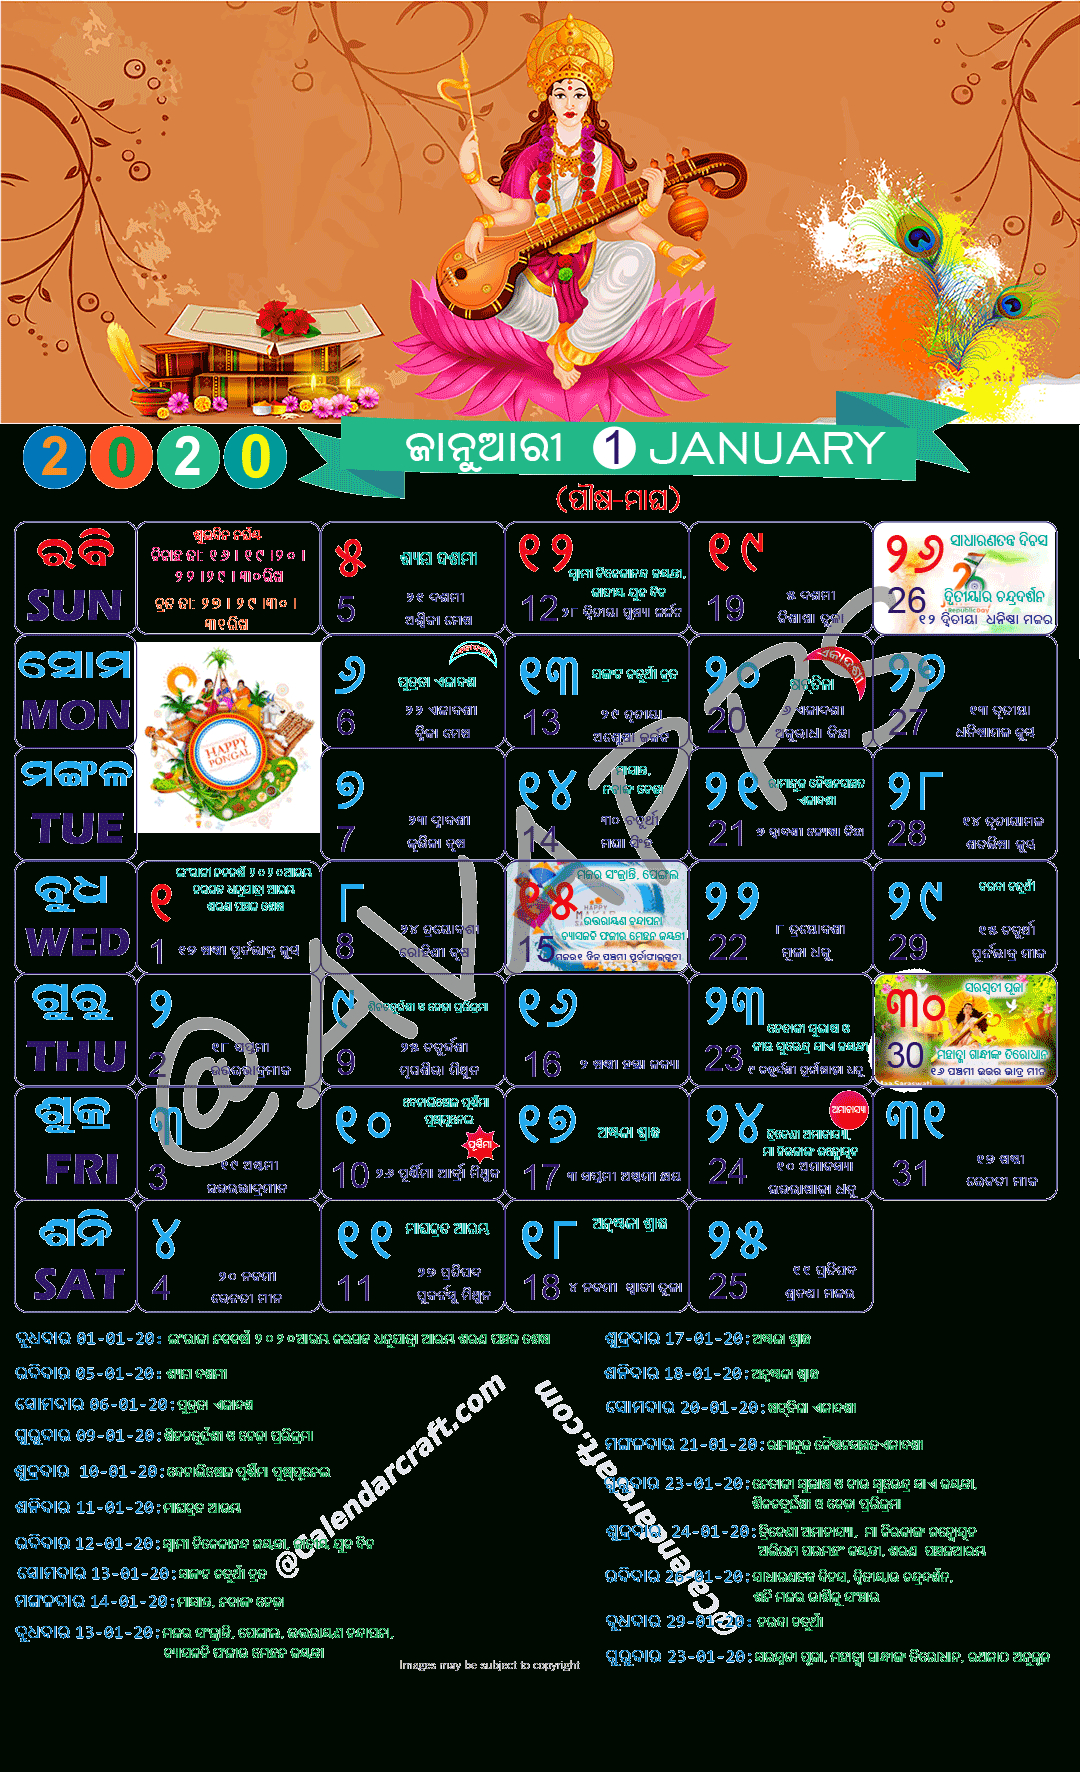 Odia Calendar 2020 Kohinoor Pdf | Seg regarding July 2020 Odia Calendar